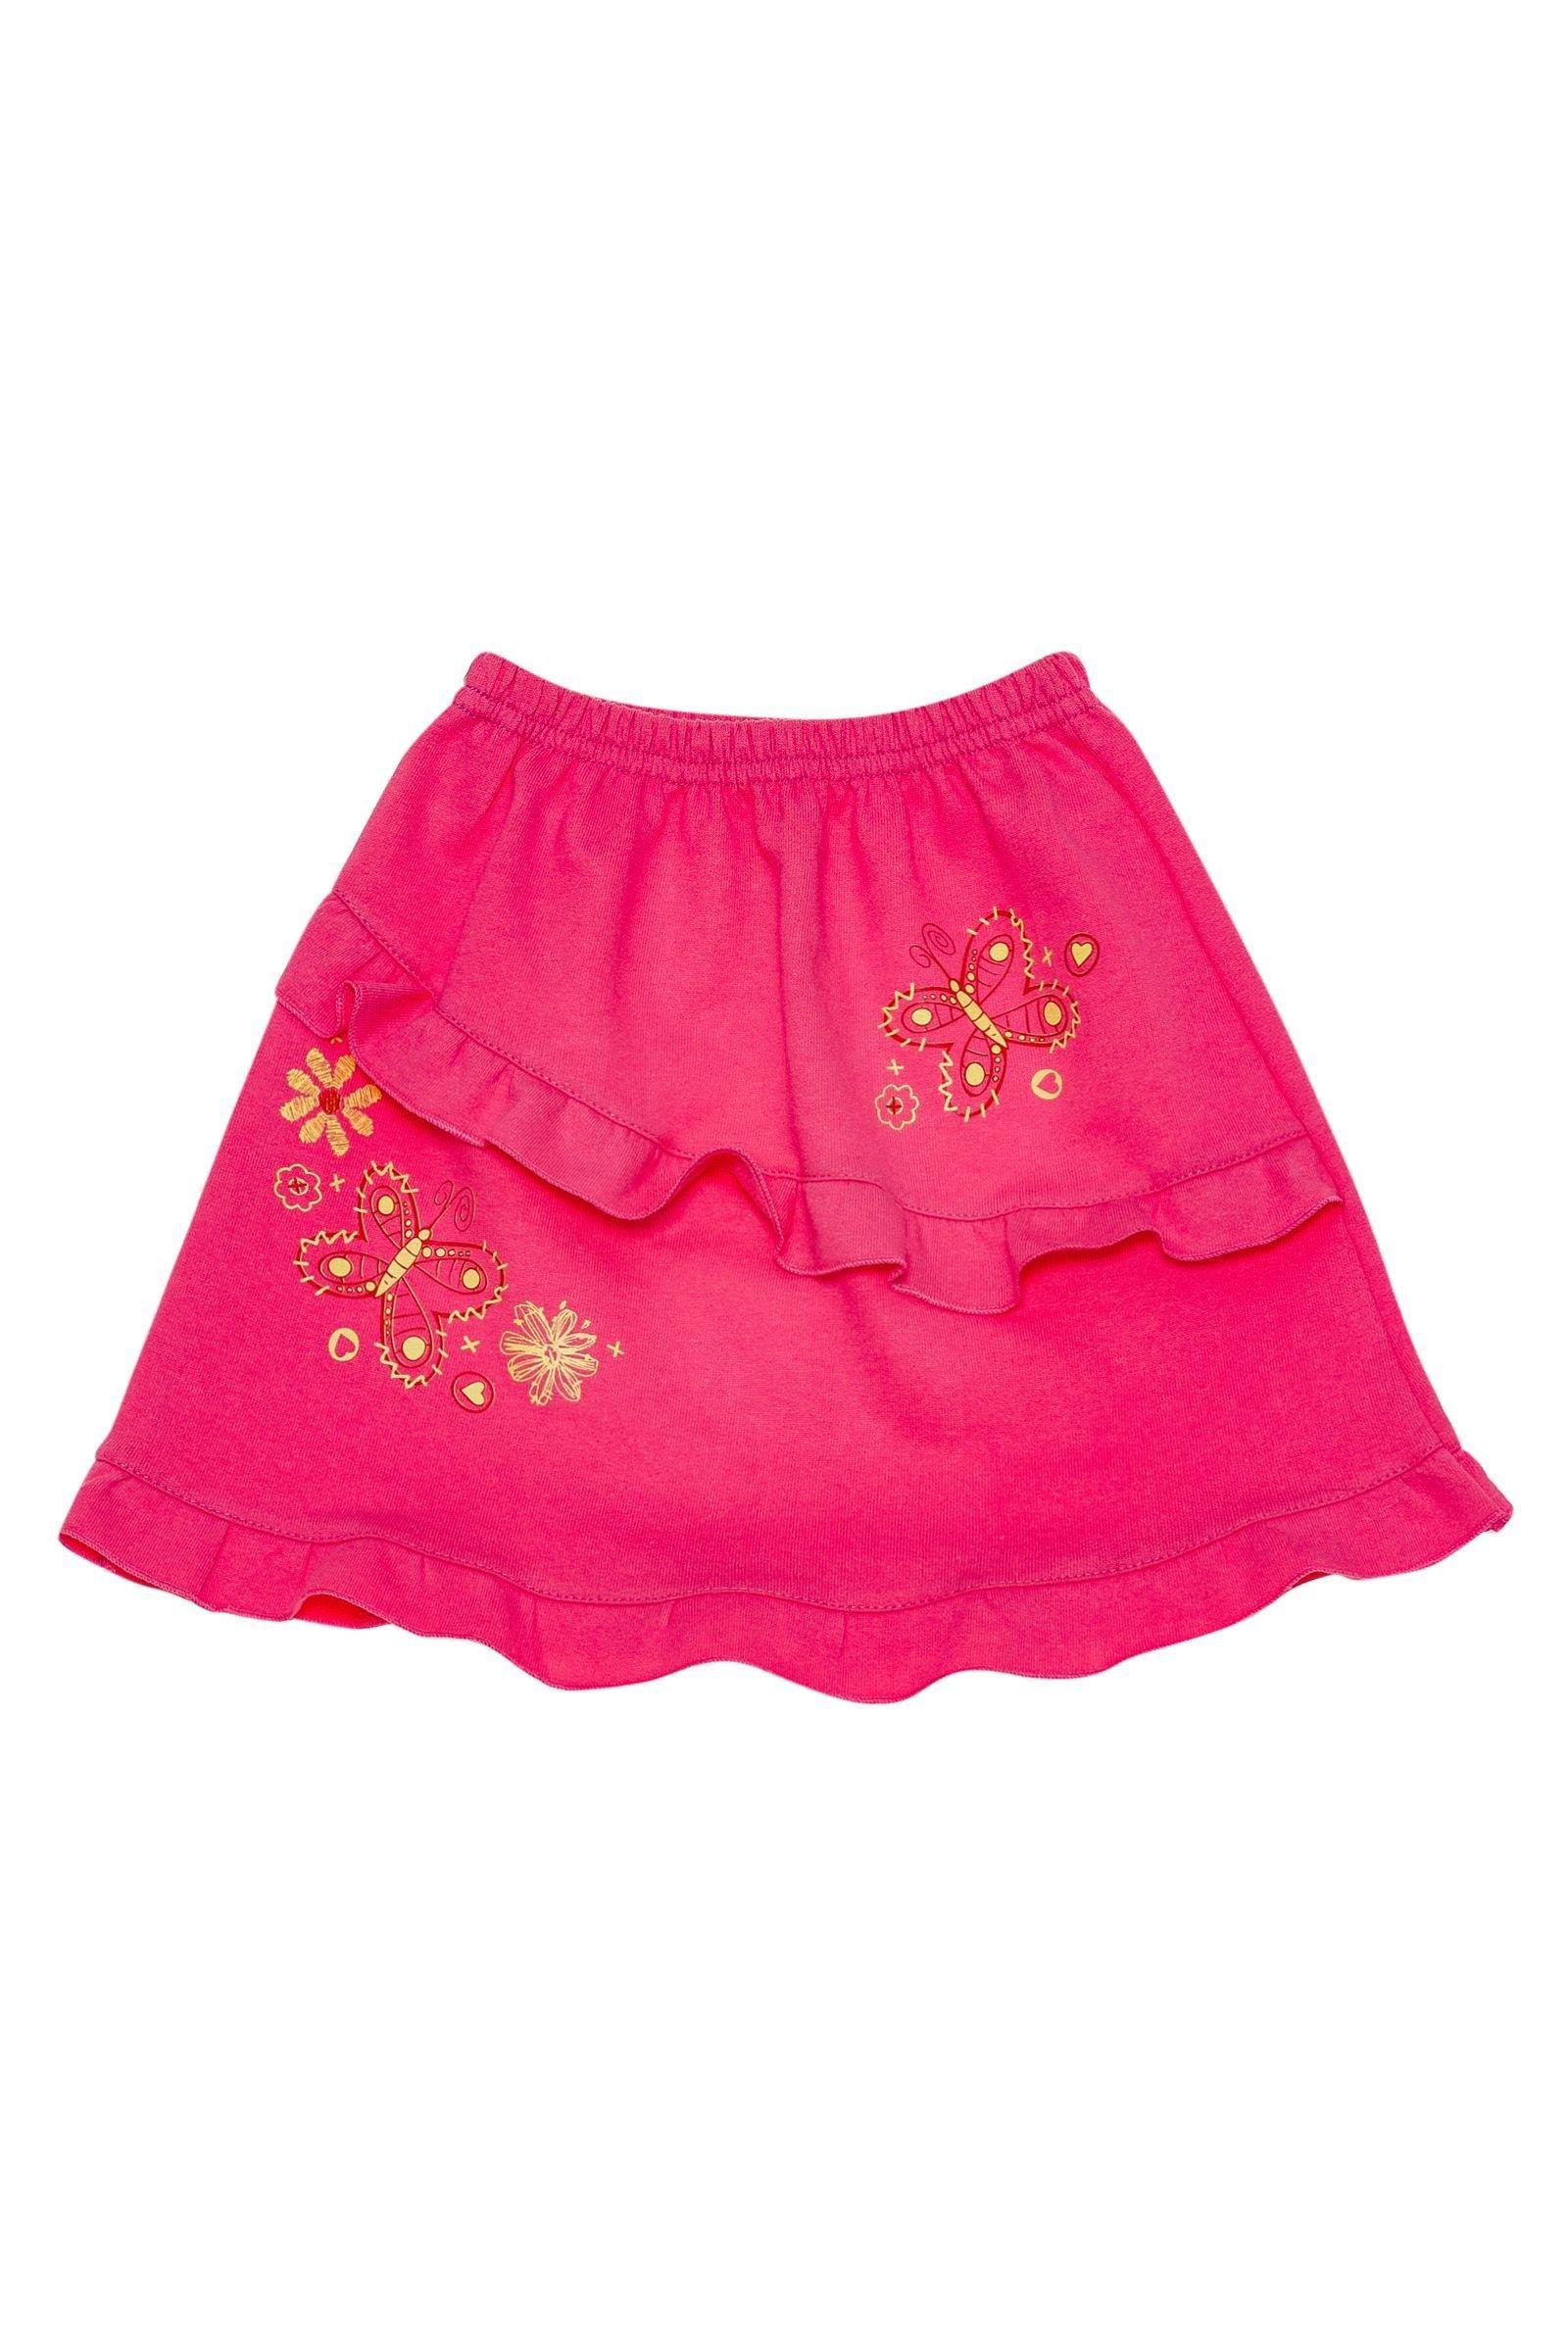 Юбка для девочки ALLAL05-1216-2